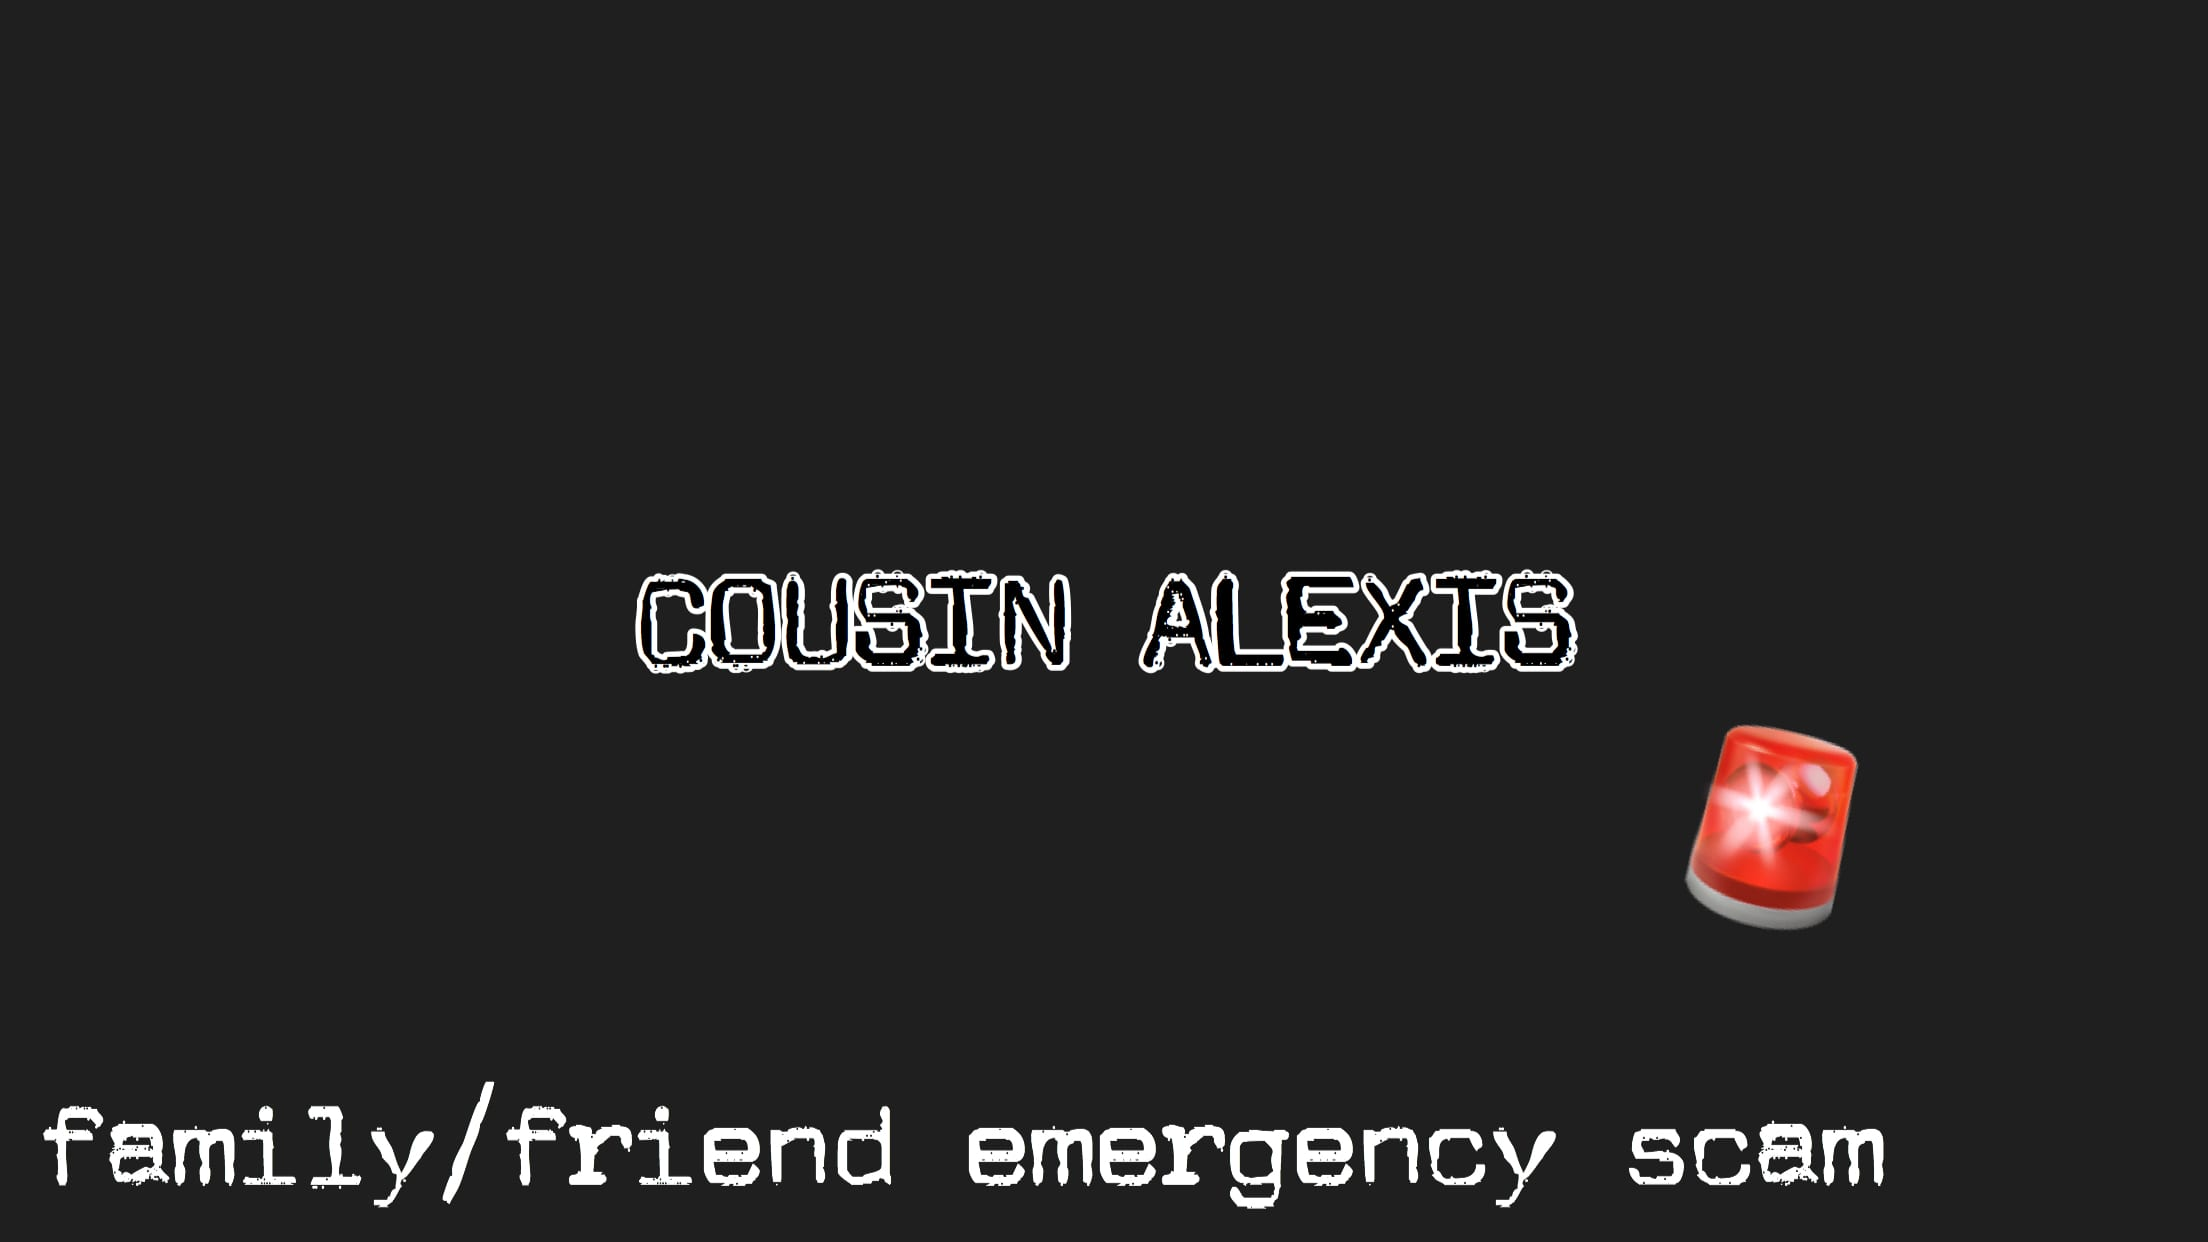 Cousin Alexis